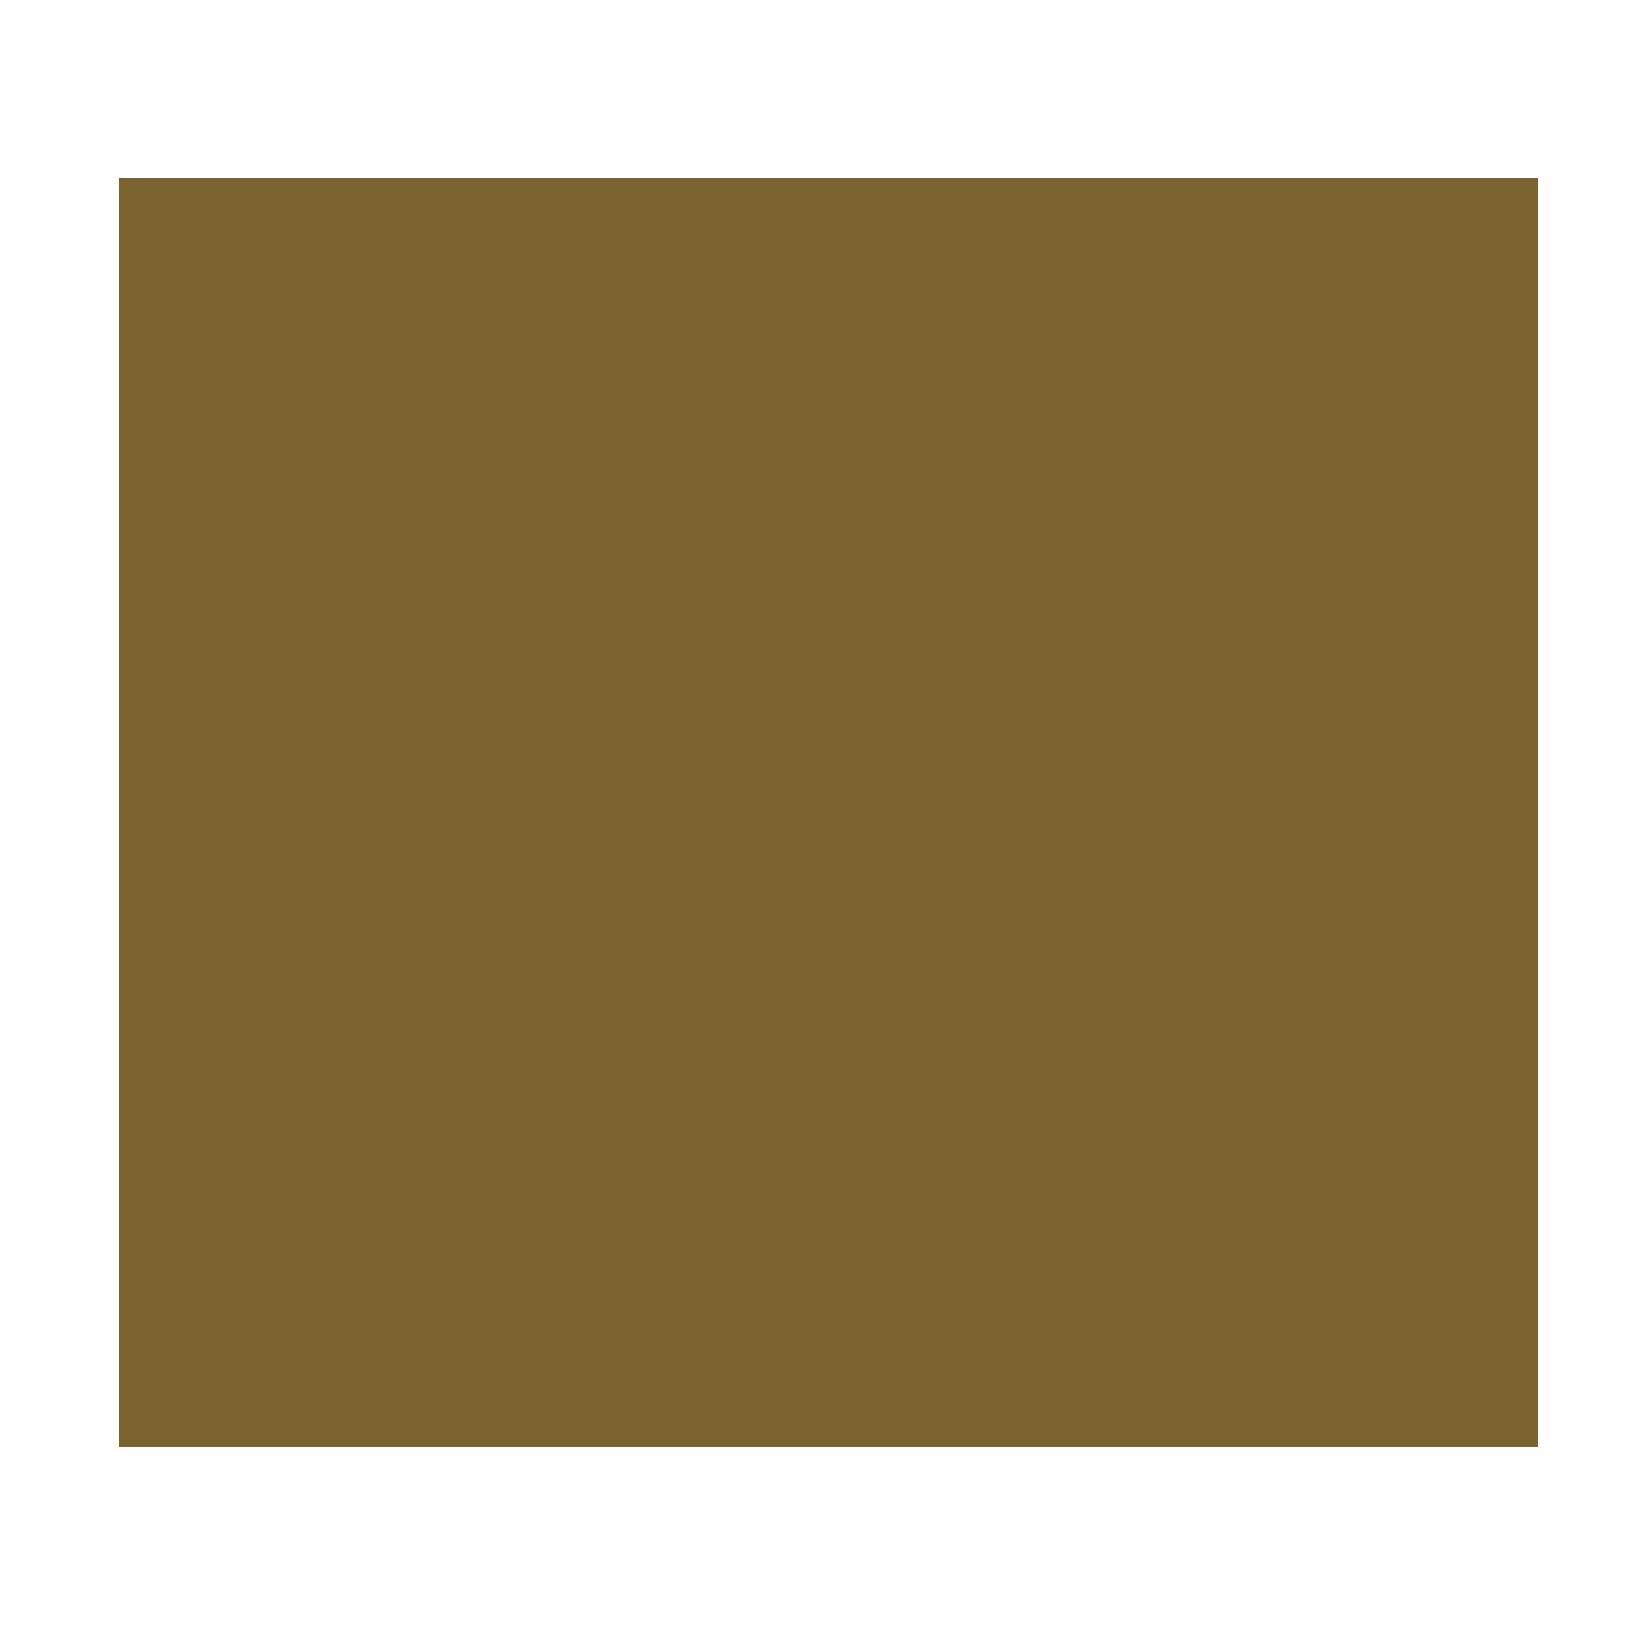 Zum Edengarten - Anita Mend